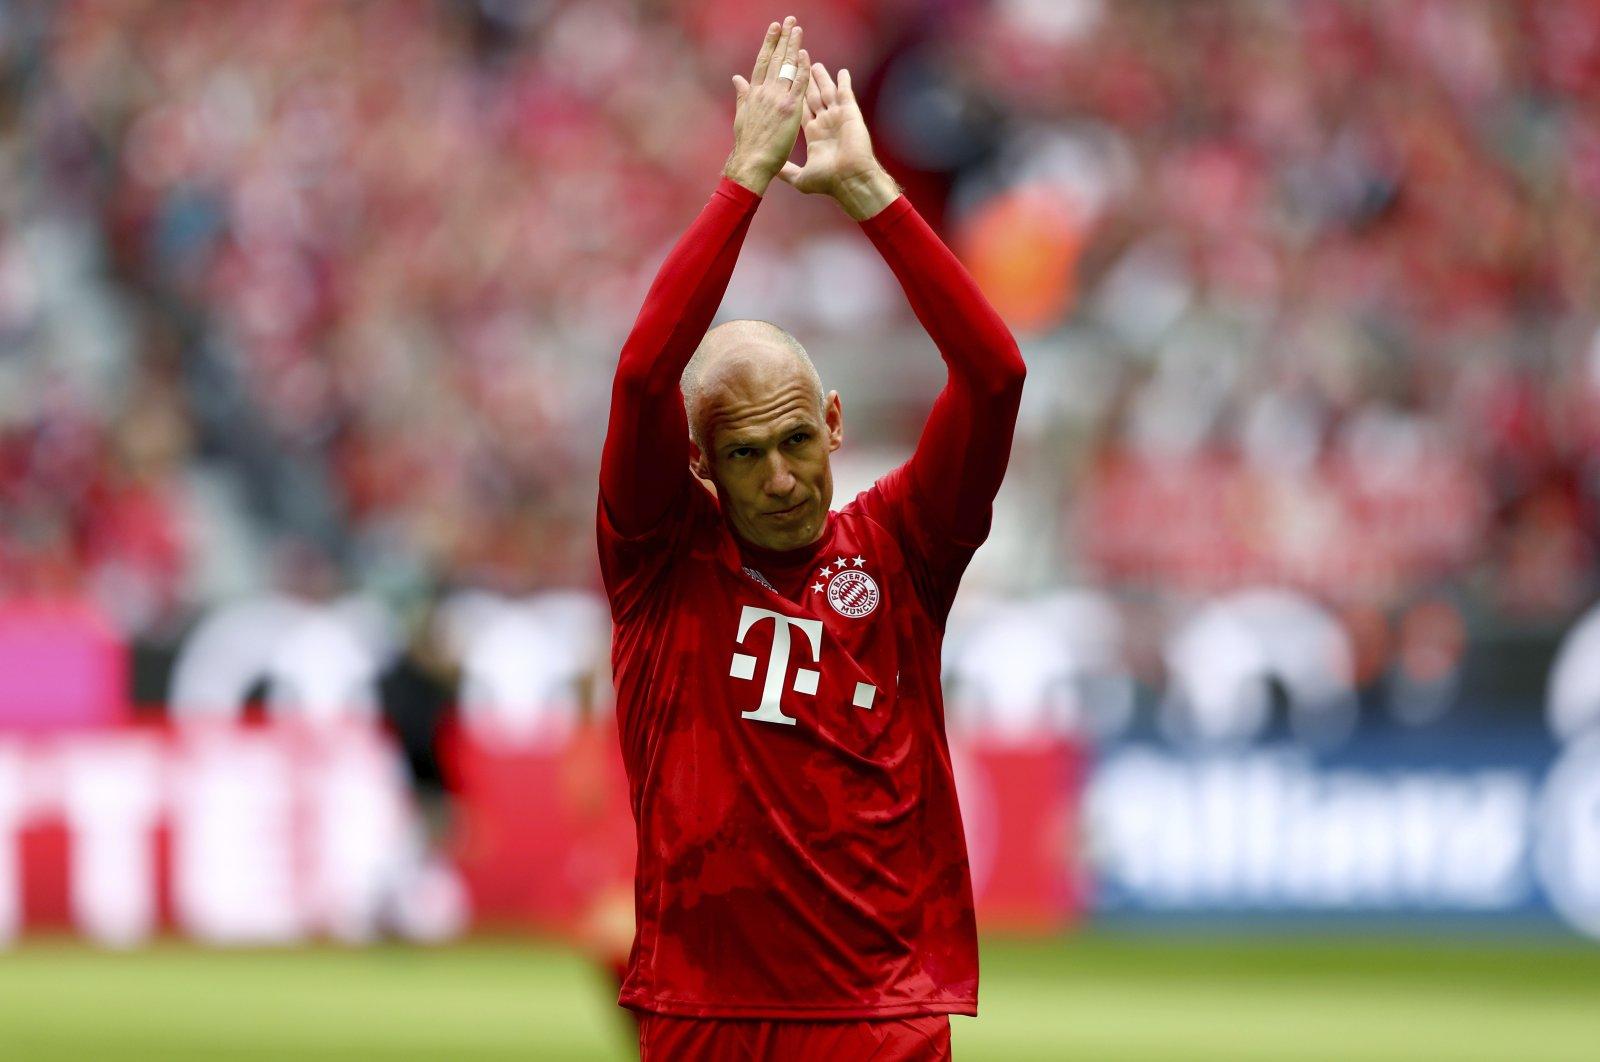 Bayern's Arjen Robben applaudes prior to a German Bundesliga match against Eintracht Frankfurt in Munich, Germany, May 18, 2019. (AP Photo)